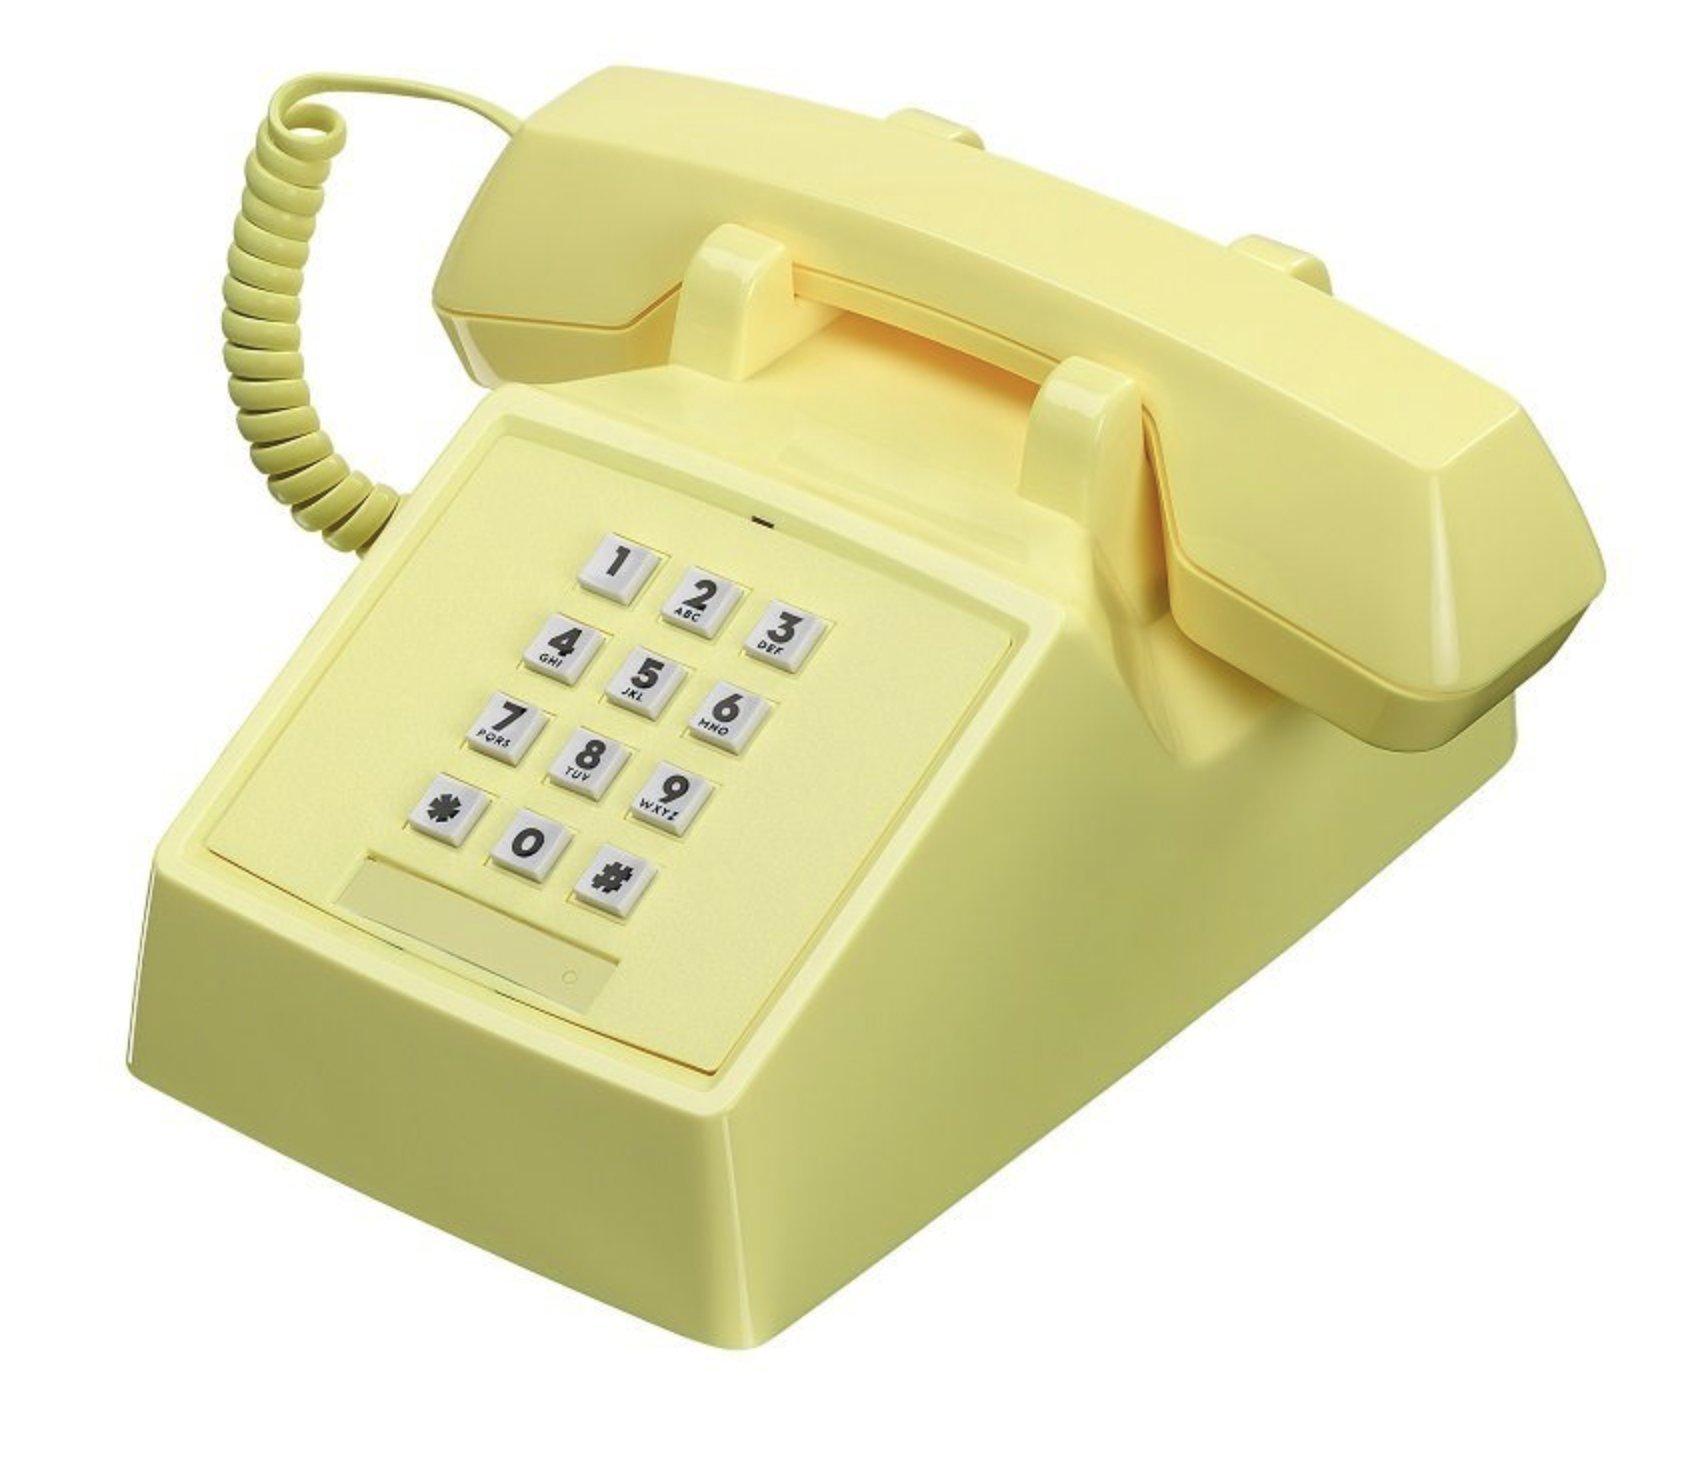 Wild Wood 2500 Classic Retro Landline Phone, Lemon Sorbet